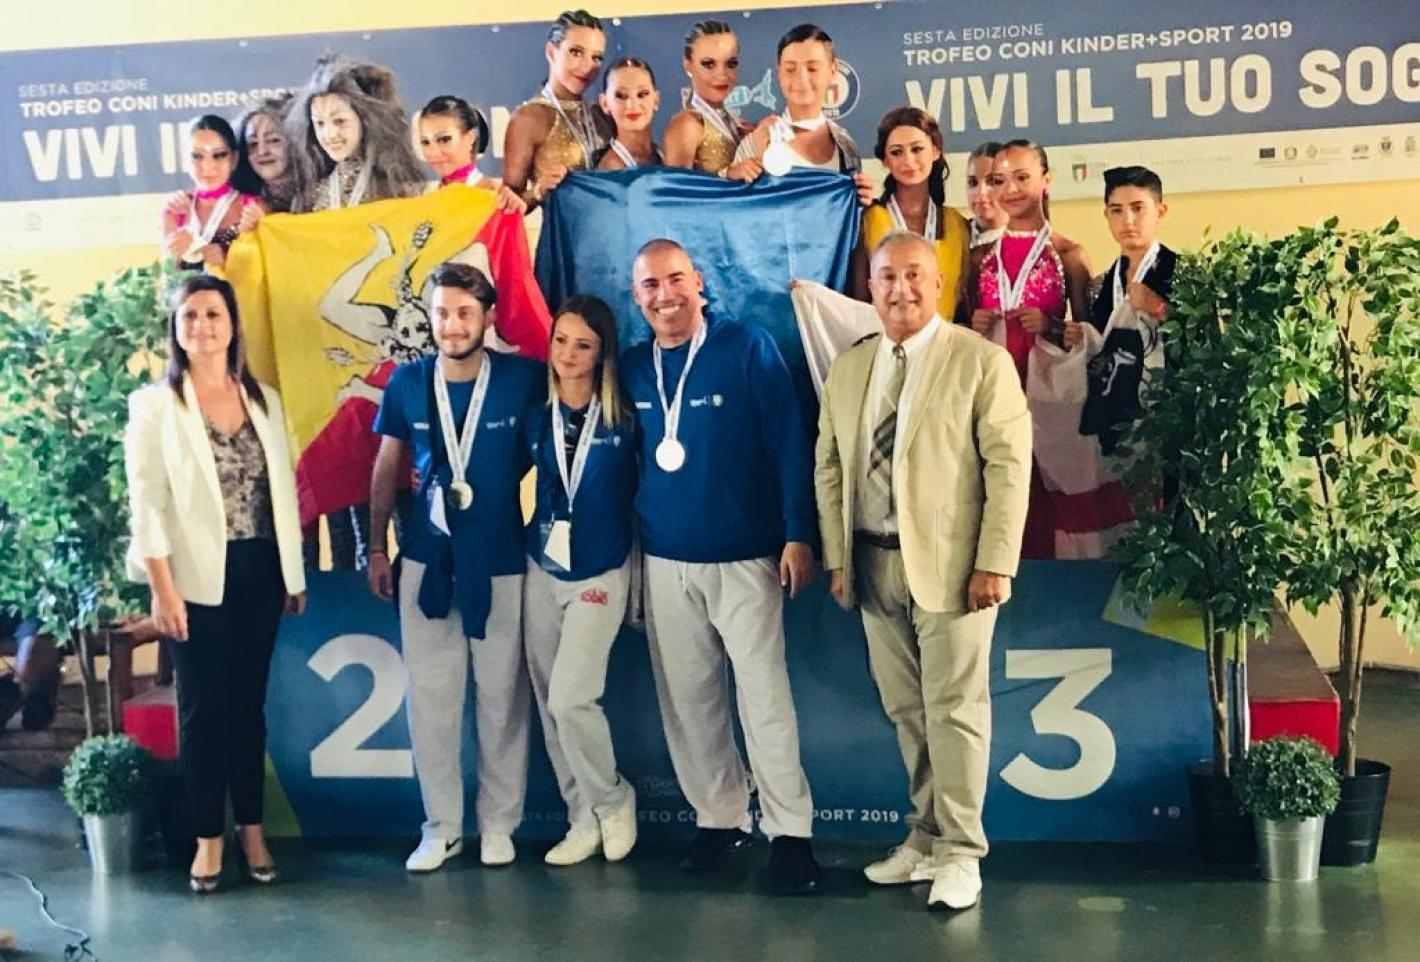 Trofeo CONI Kinder+Sport 2019